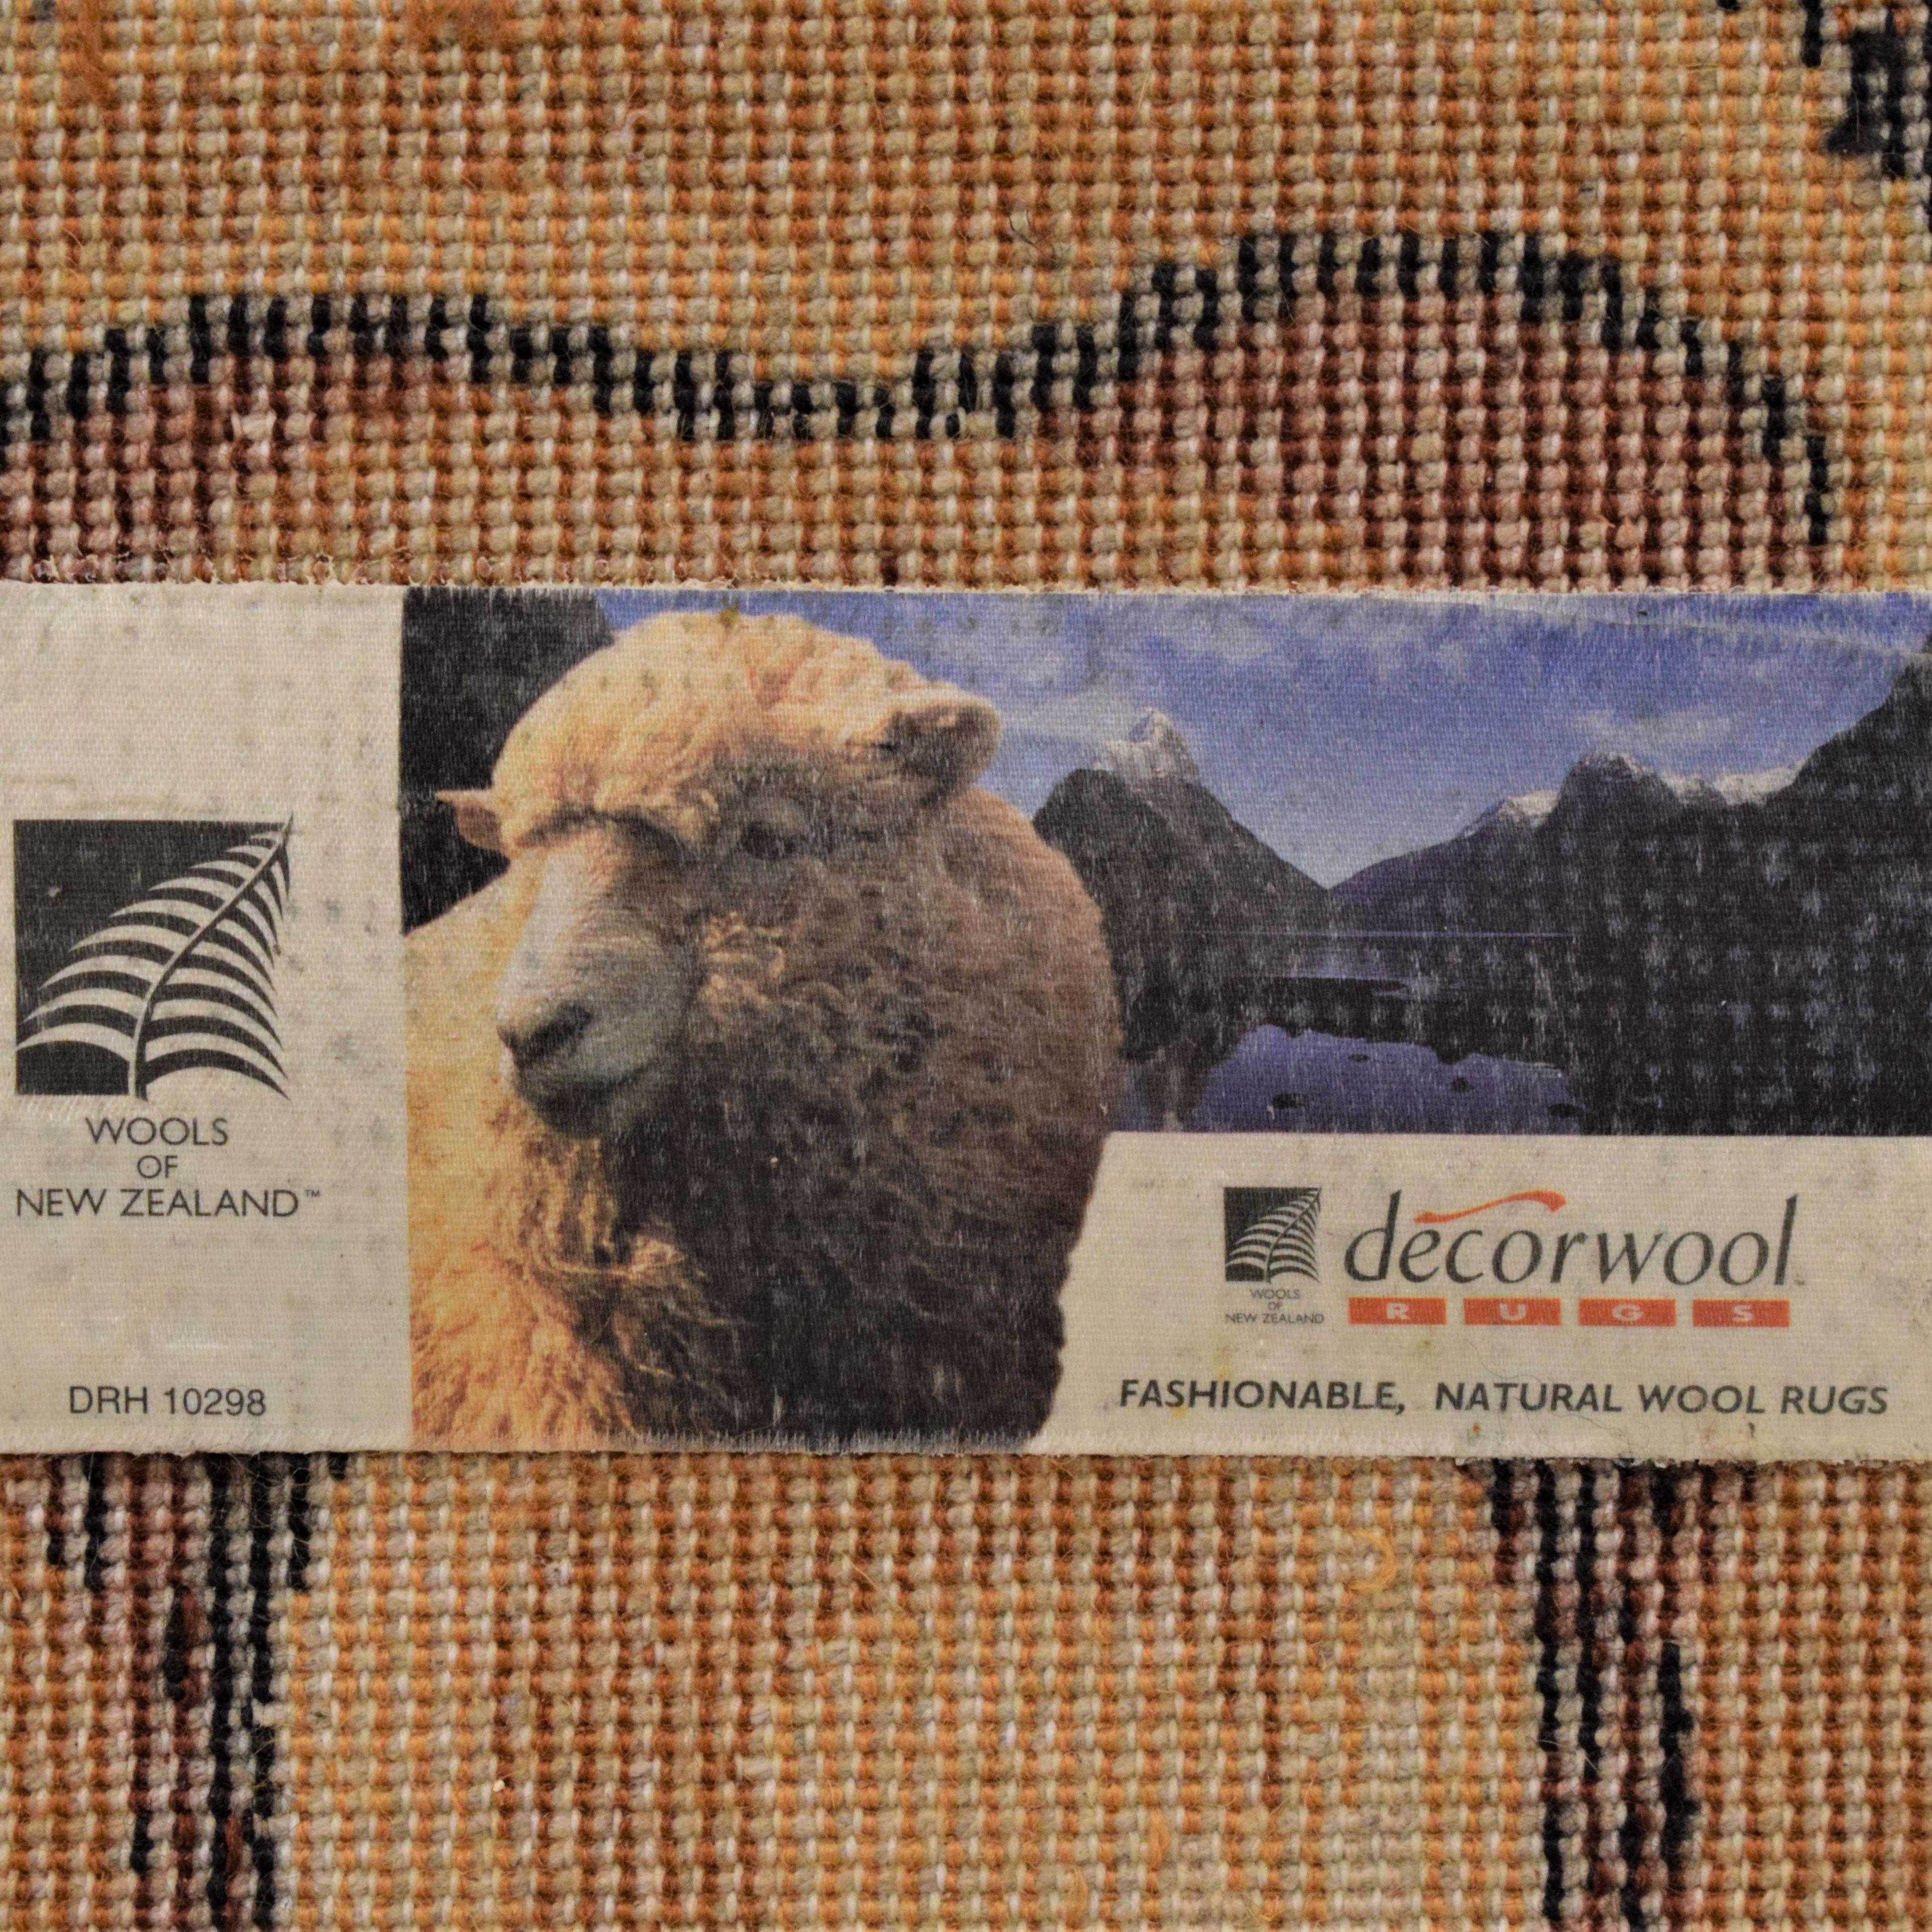 Decorwool Decorwool Versace-Inspired Recangular Rug used